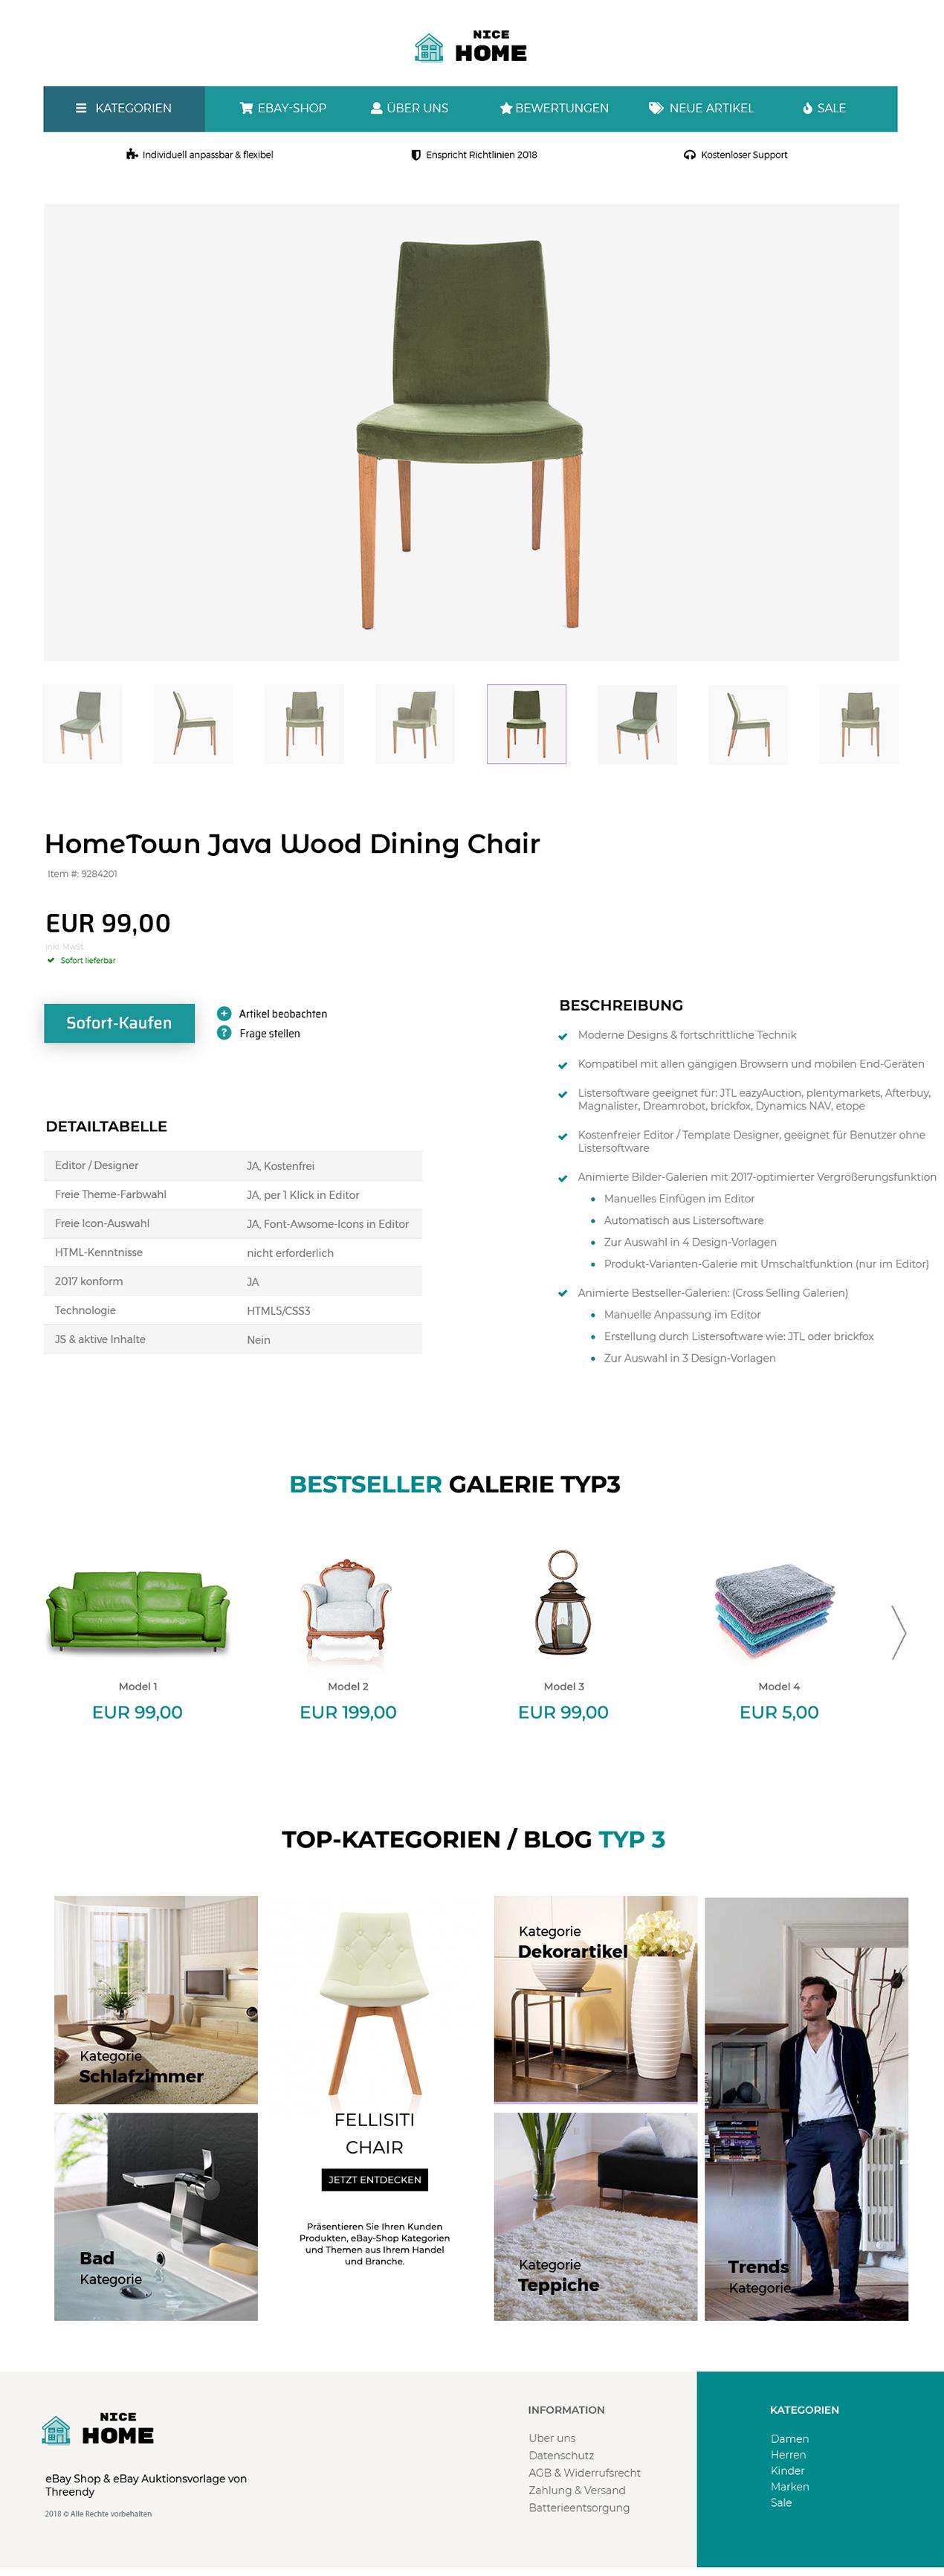 JTL eazyAuction UNIQUE eBayVorlage 2018 Mobile Design ...